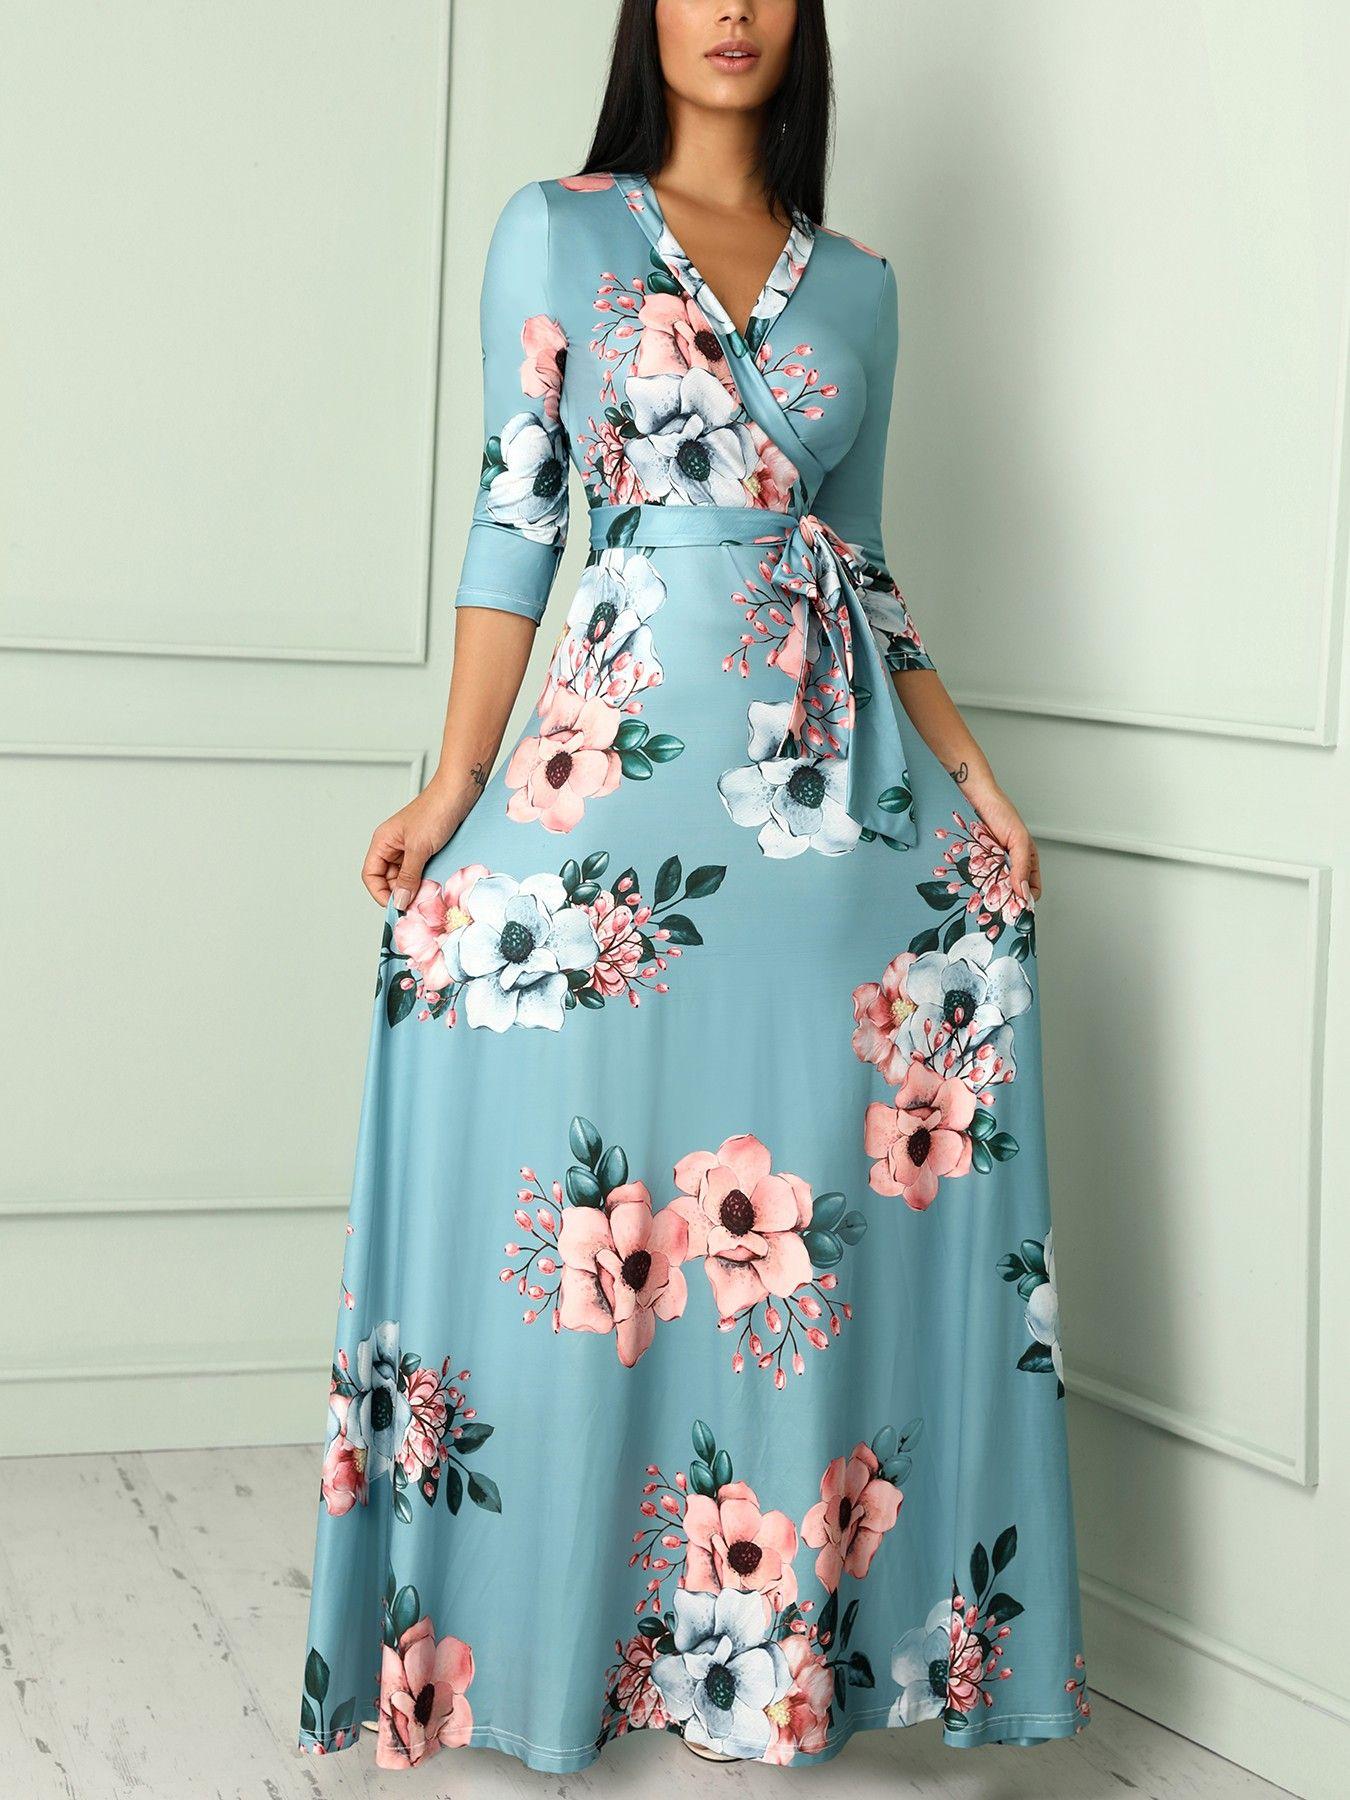 c3a634f47a81 Shop Women s Clothing